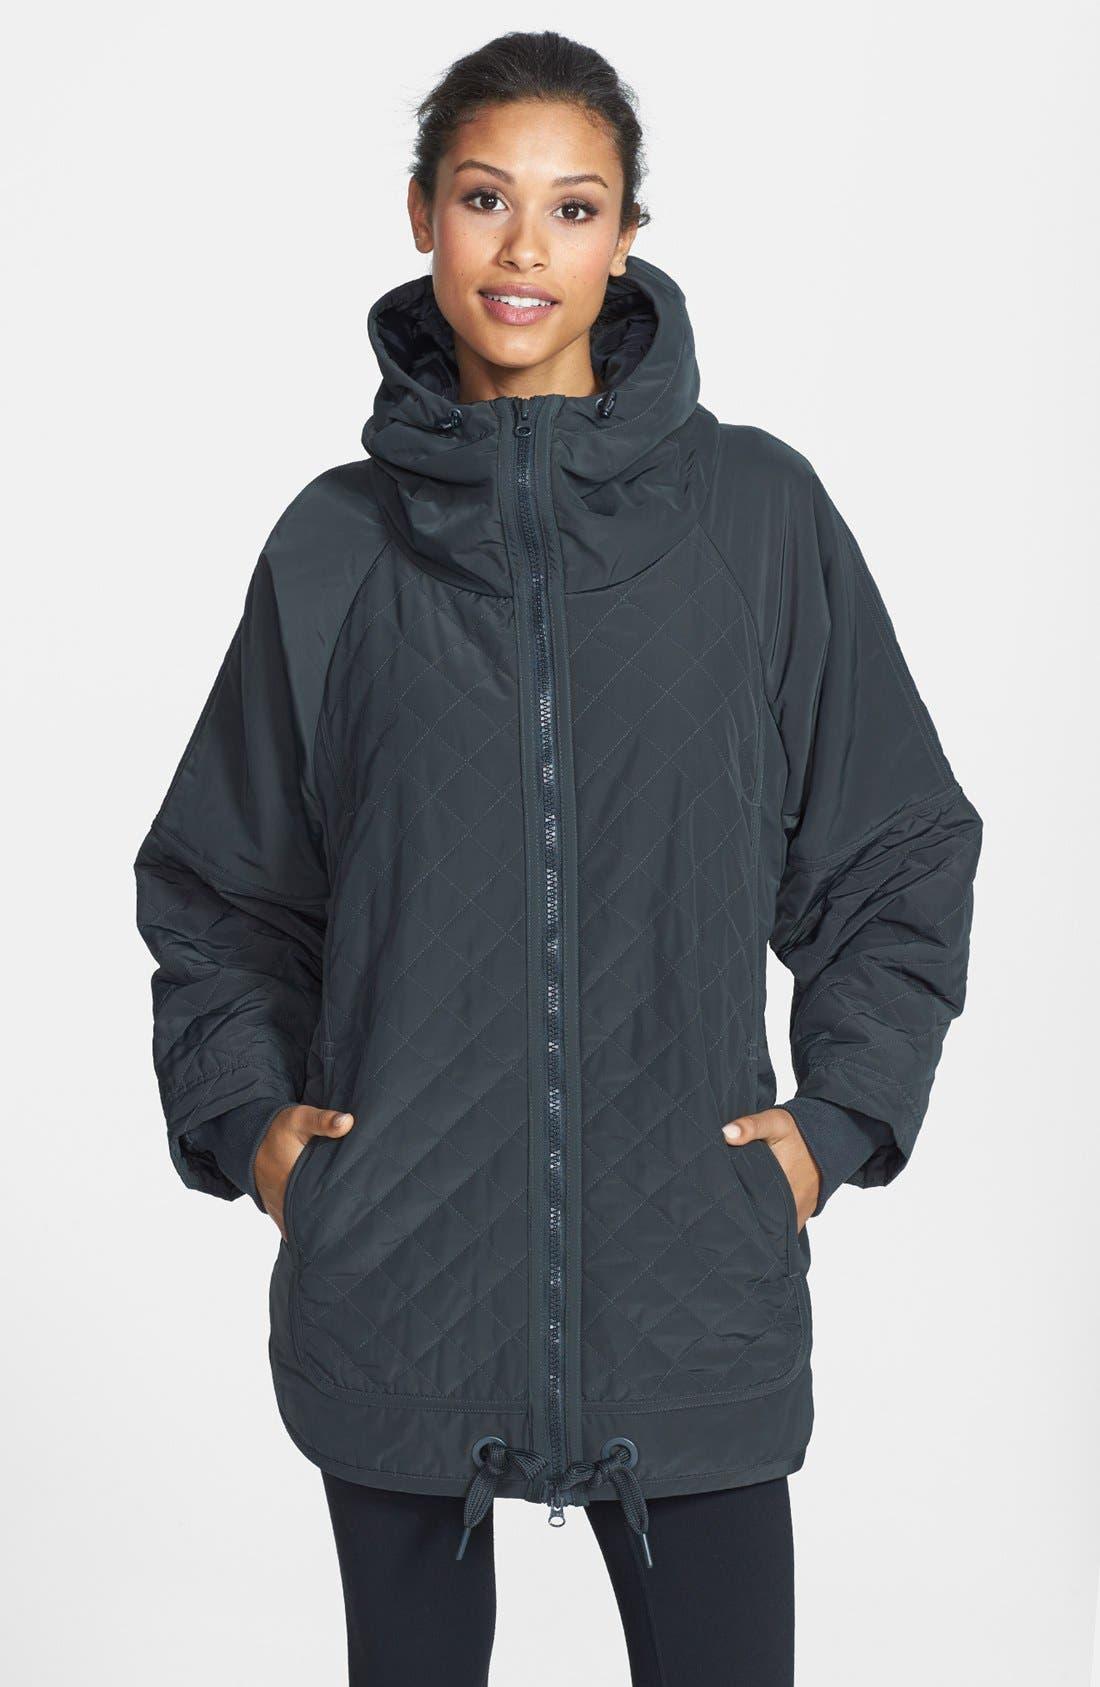 Alternate Image 1 Selected - adidas by Stella McCartney 'Wintersport' Hooded Jacket